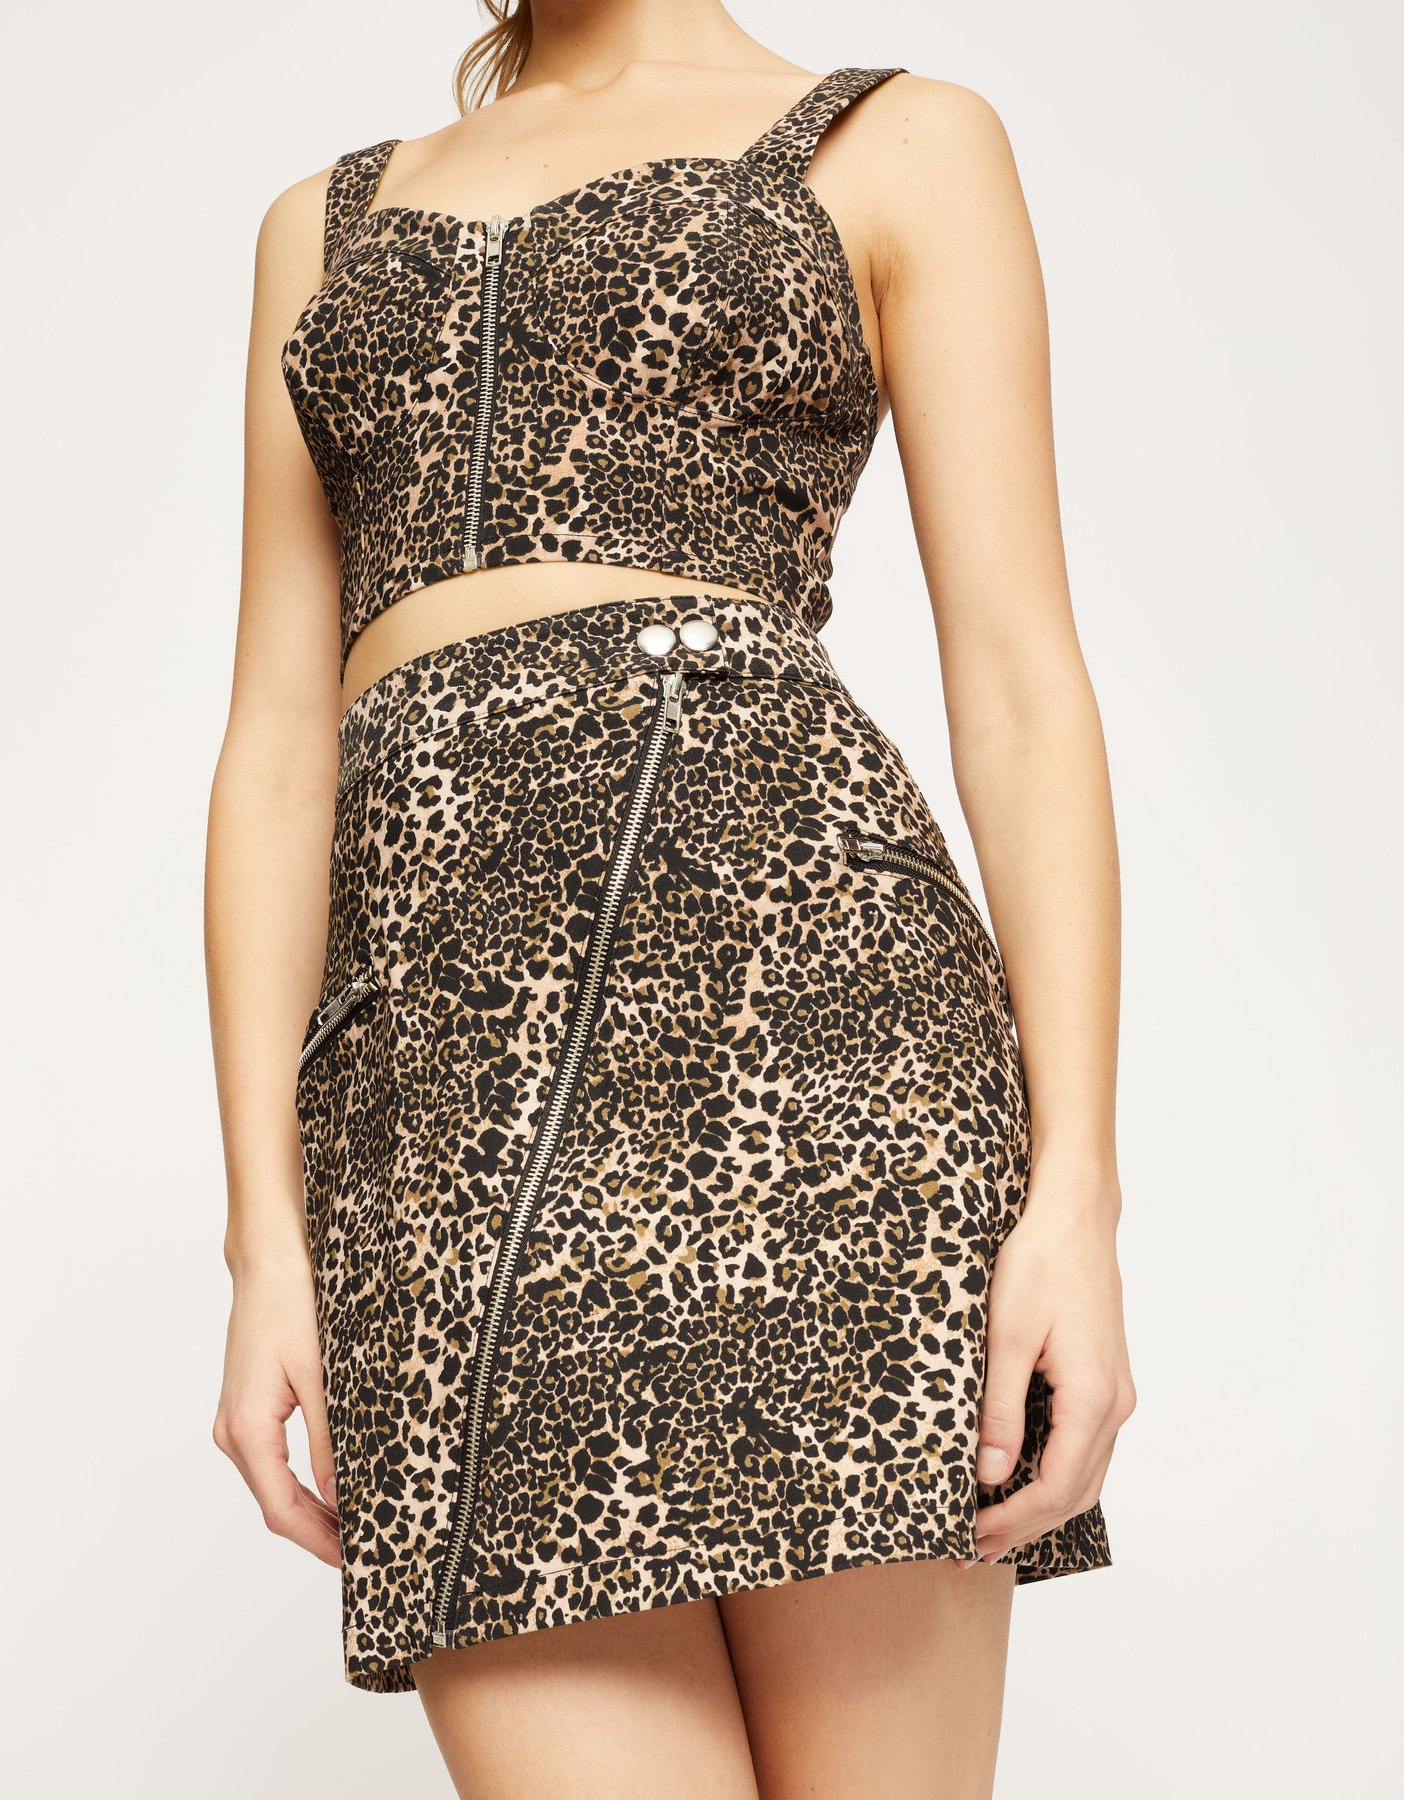 Leopard Print Bralet